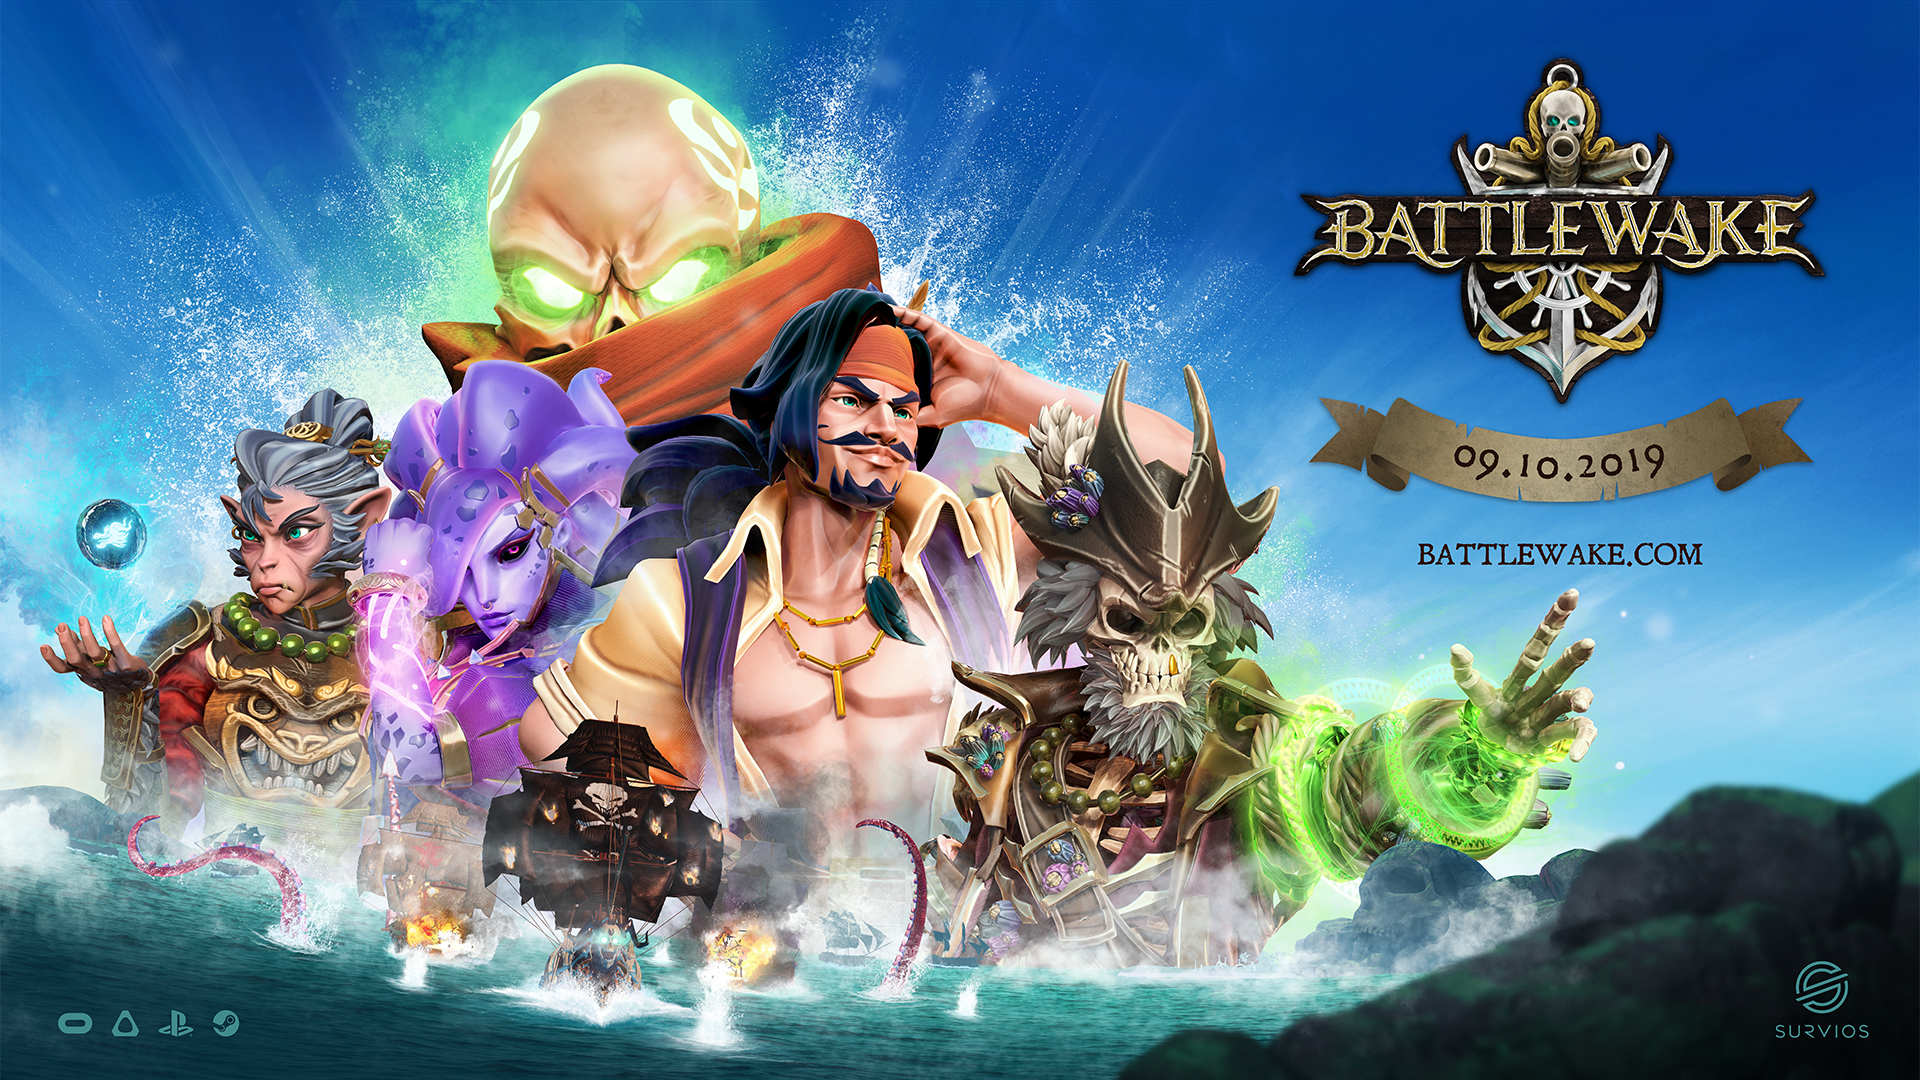 Battlewake Release Date Art - 1920x1080.